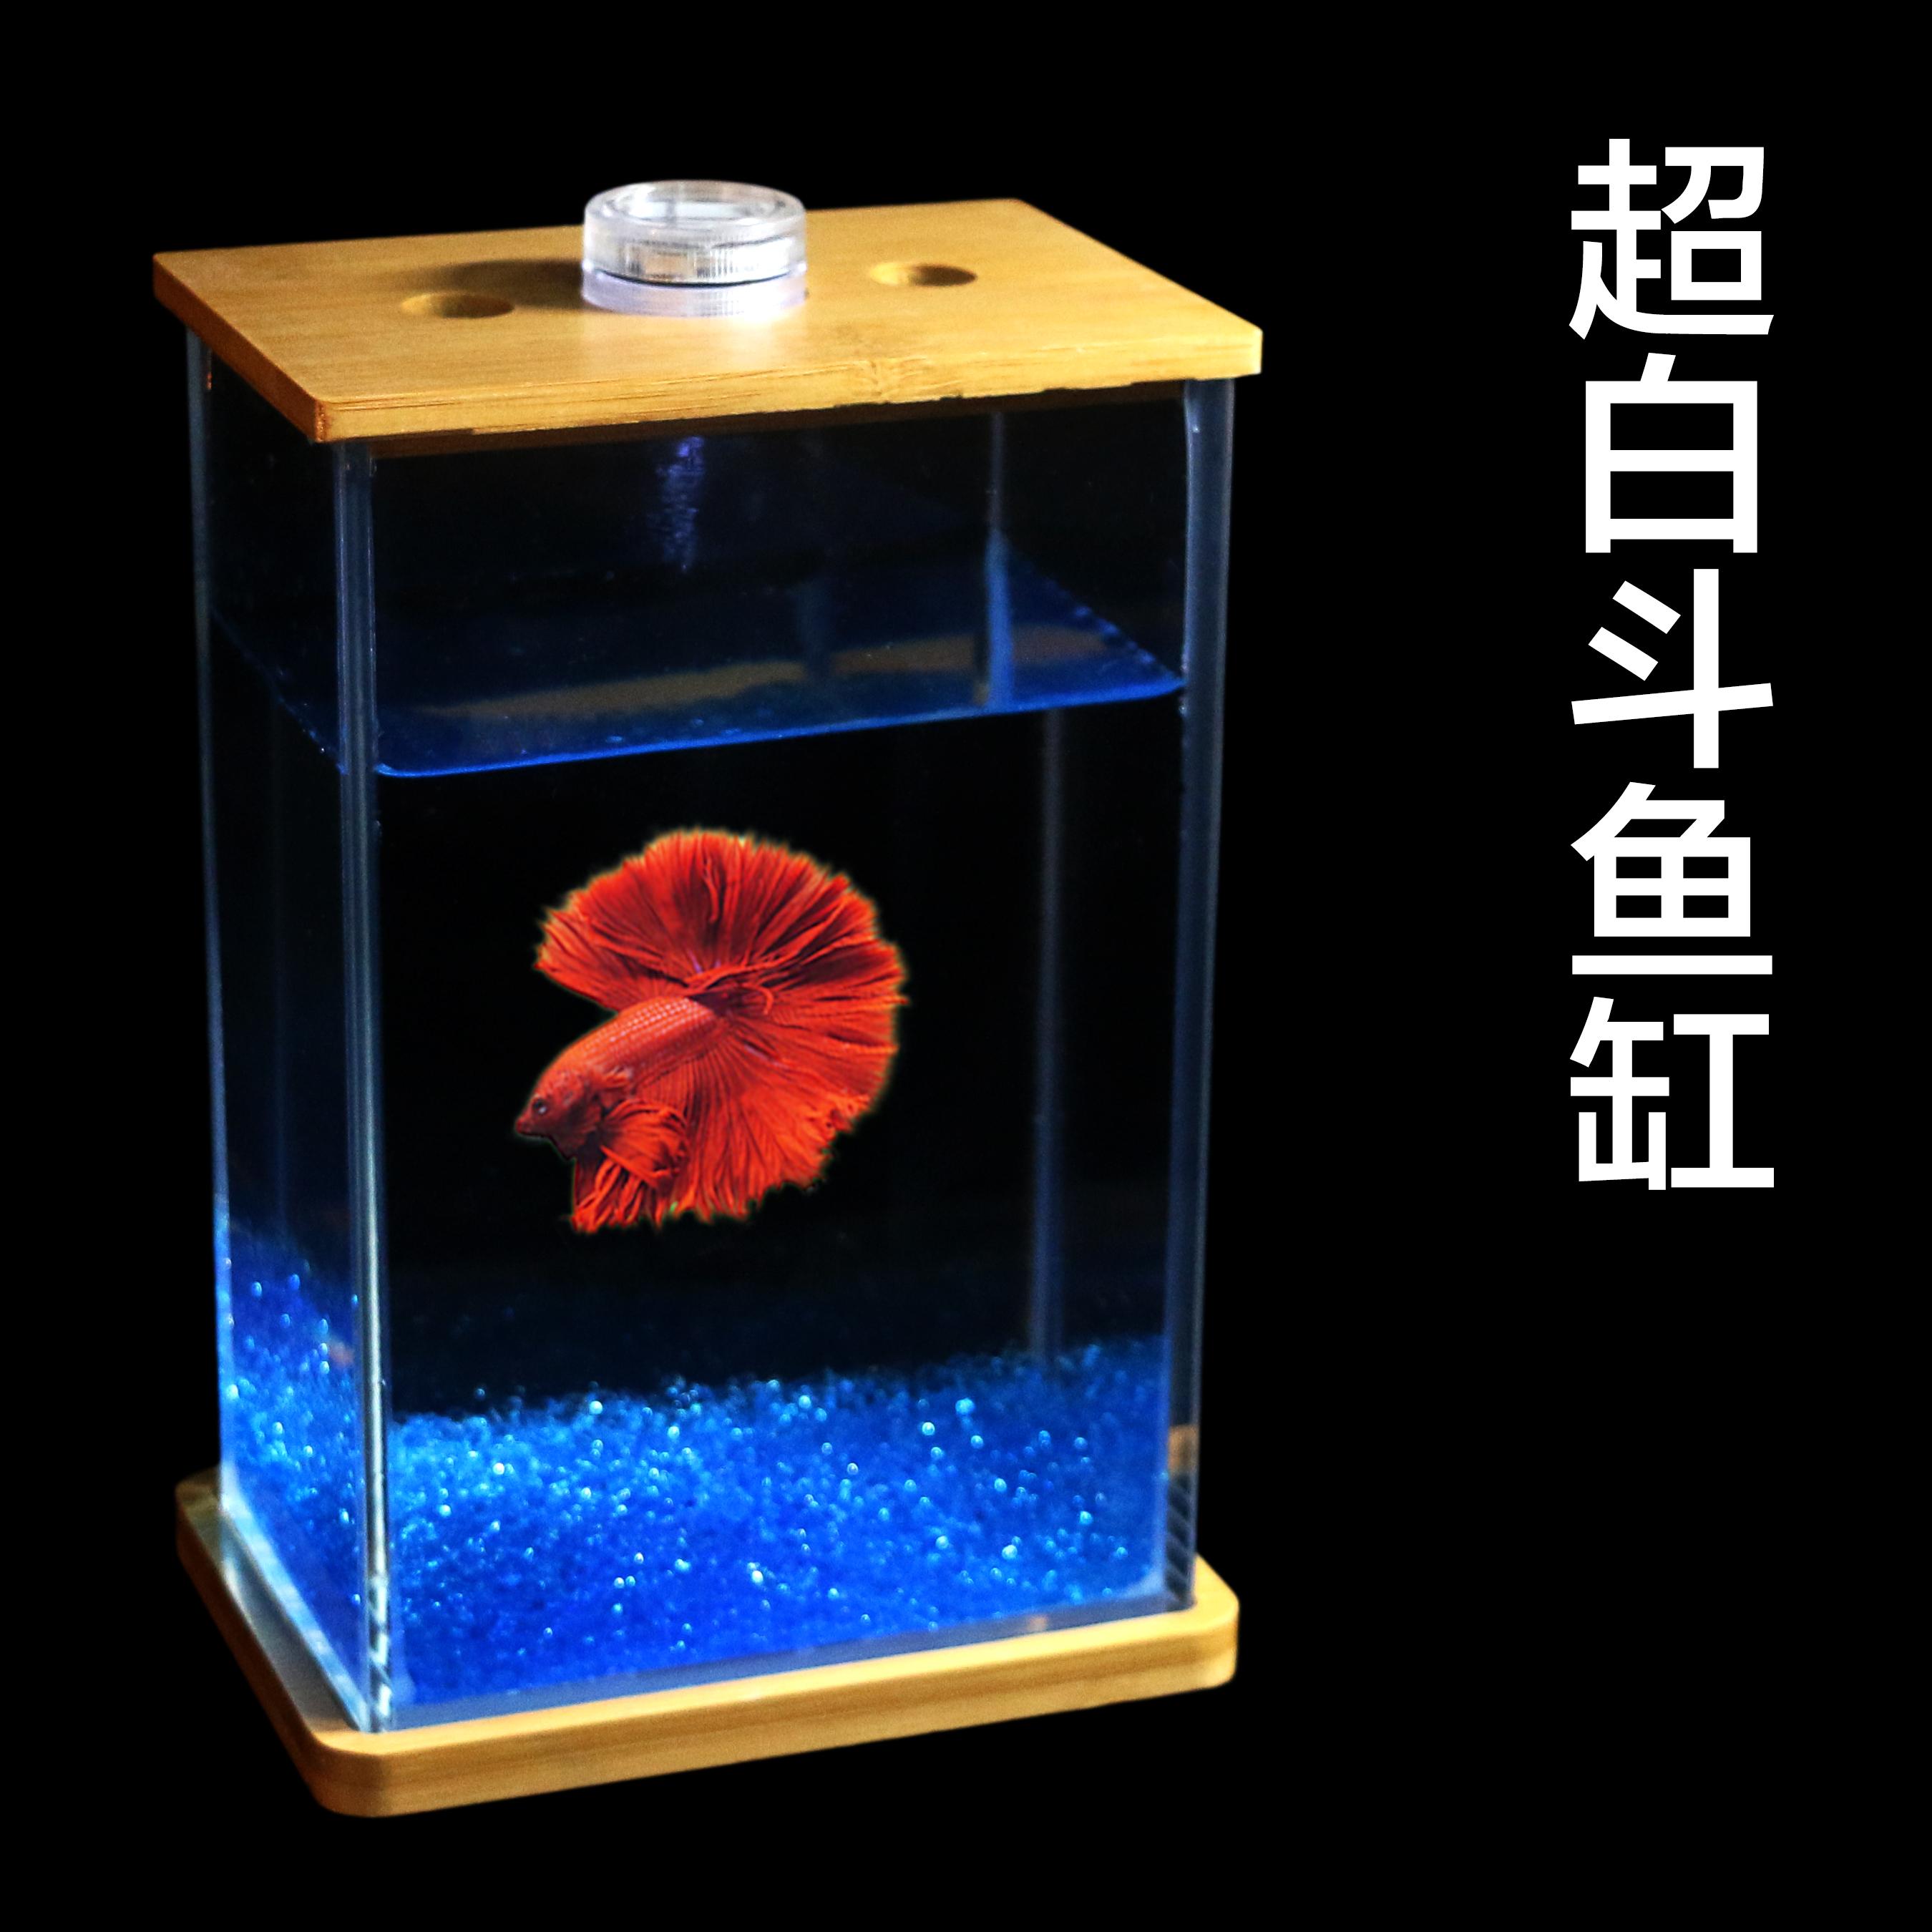 Креативные аквариумы Артикул 605225509650